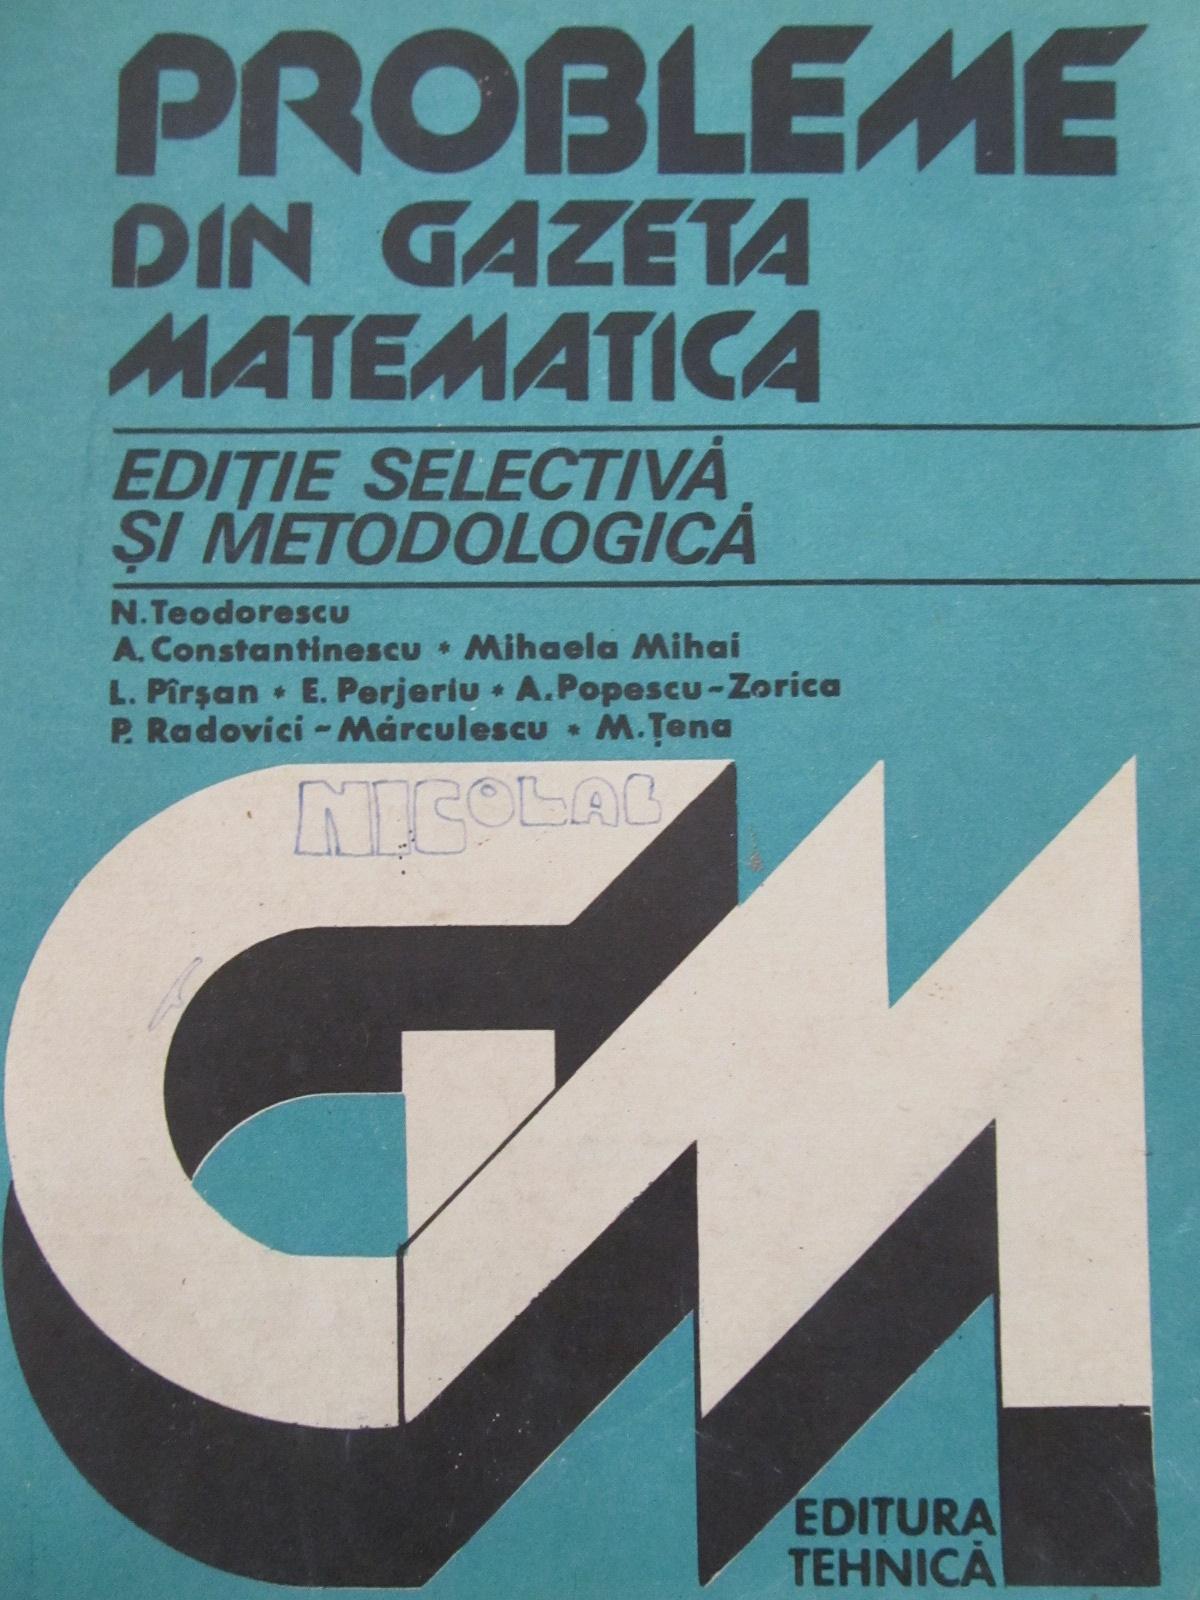 Probleme din gazeta matematica - Editie selectiva si metodologica [1] - N. Teodorescu , Mihaela Mihai , L. Parsan , E. Perjeriu , ... | Detalii carte